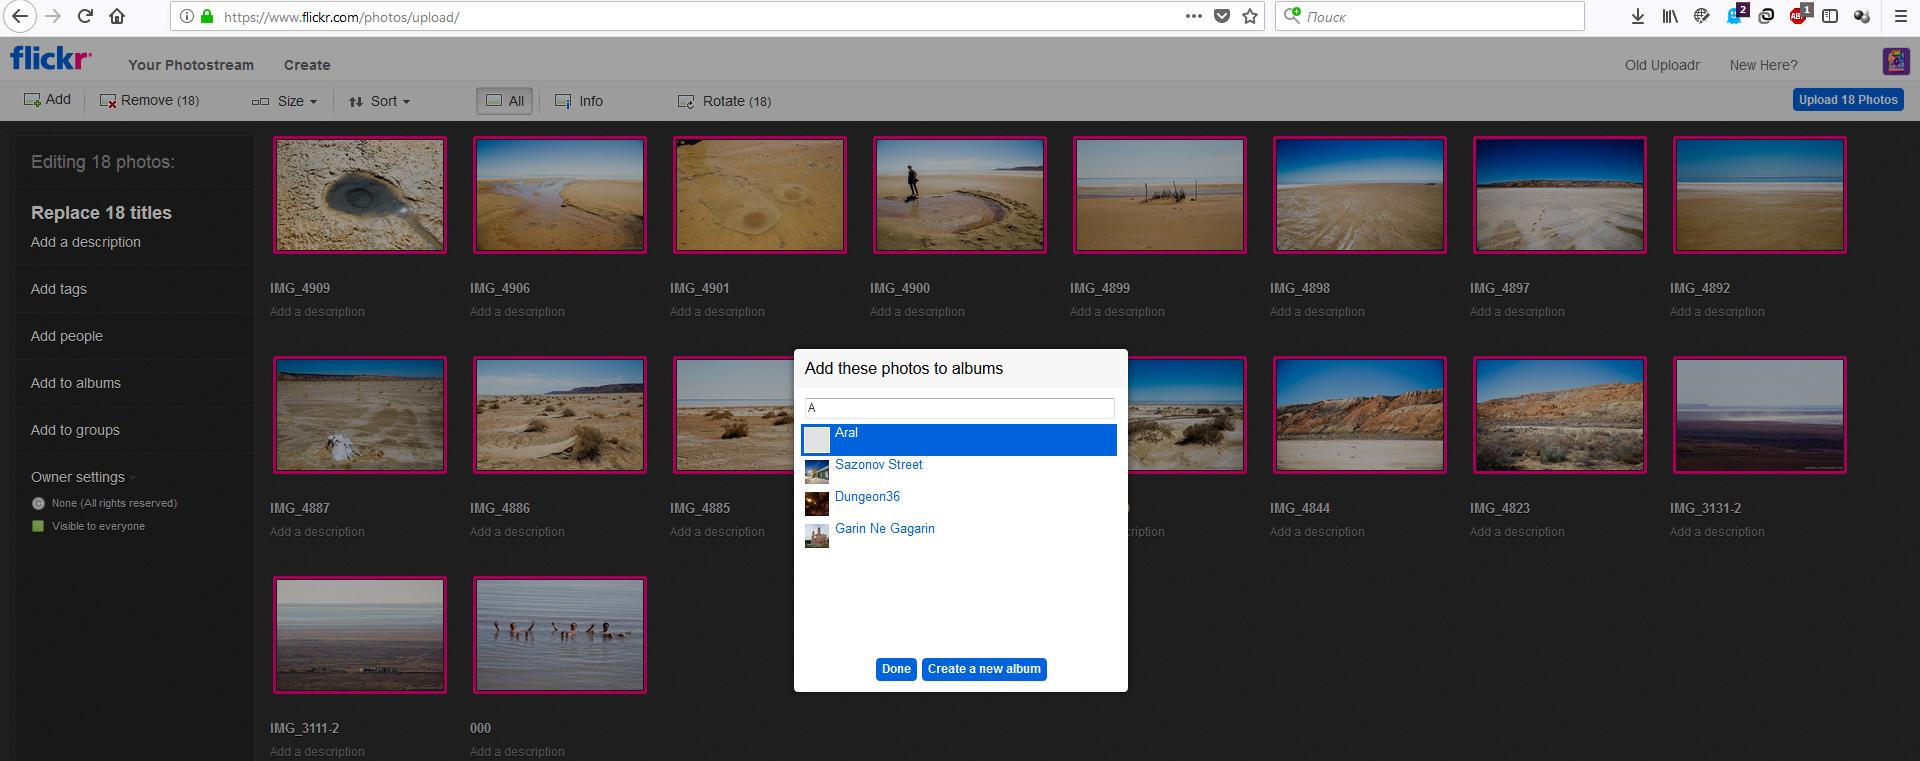 как добавлять фото на фликр задняя